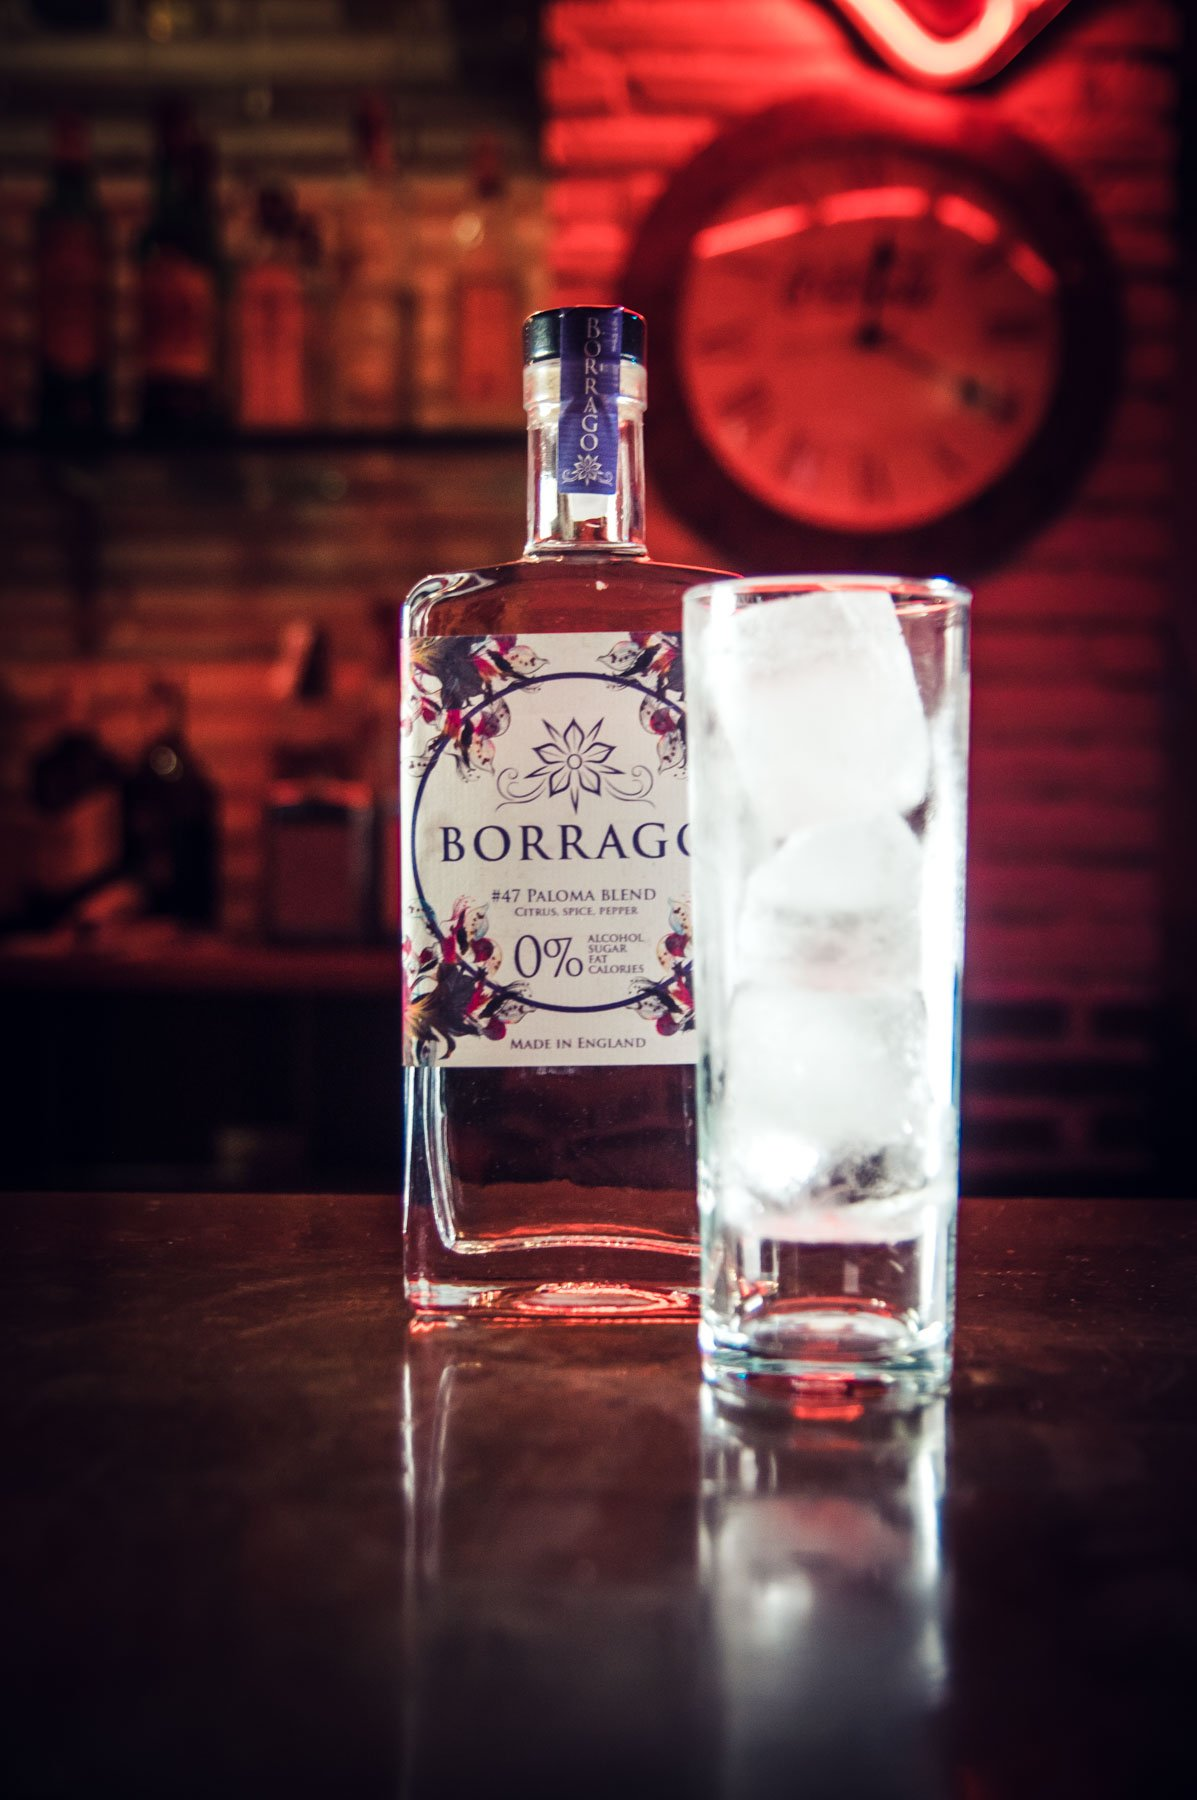 borrago spirit